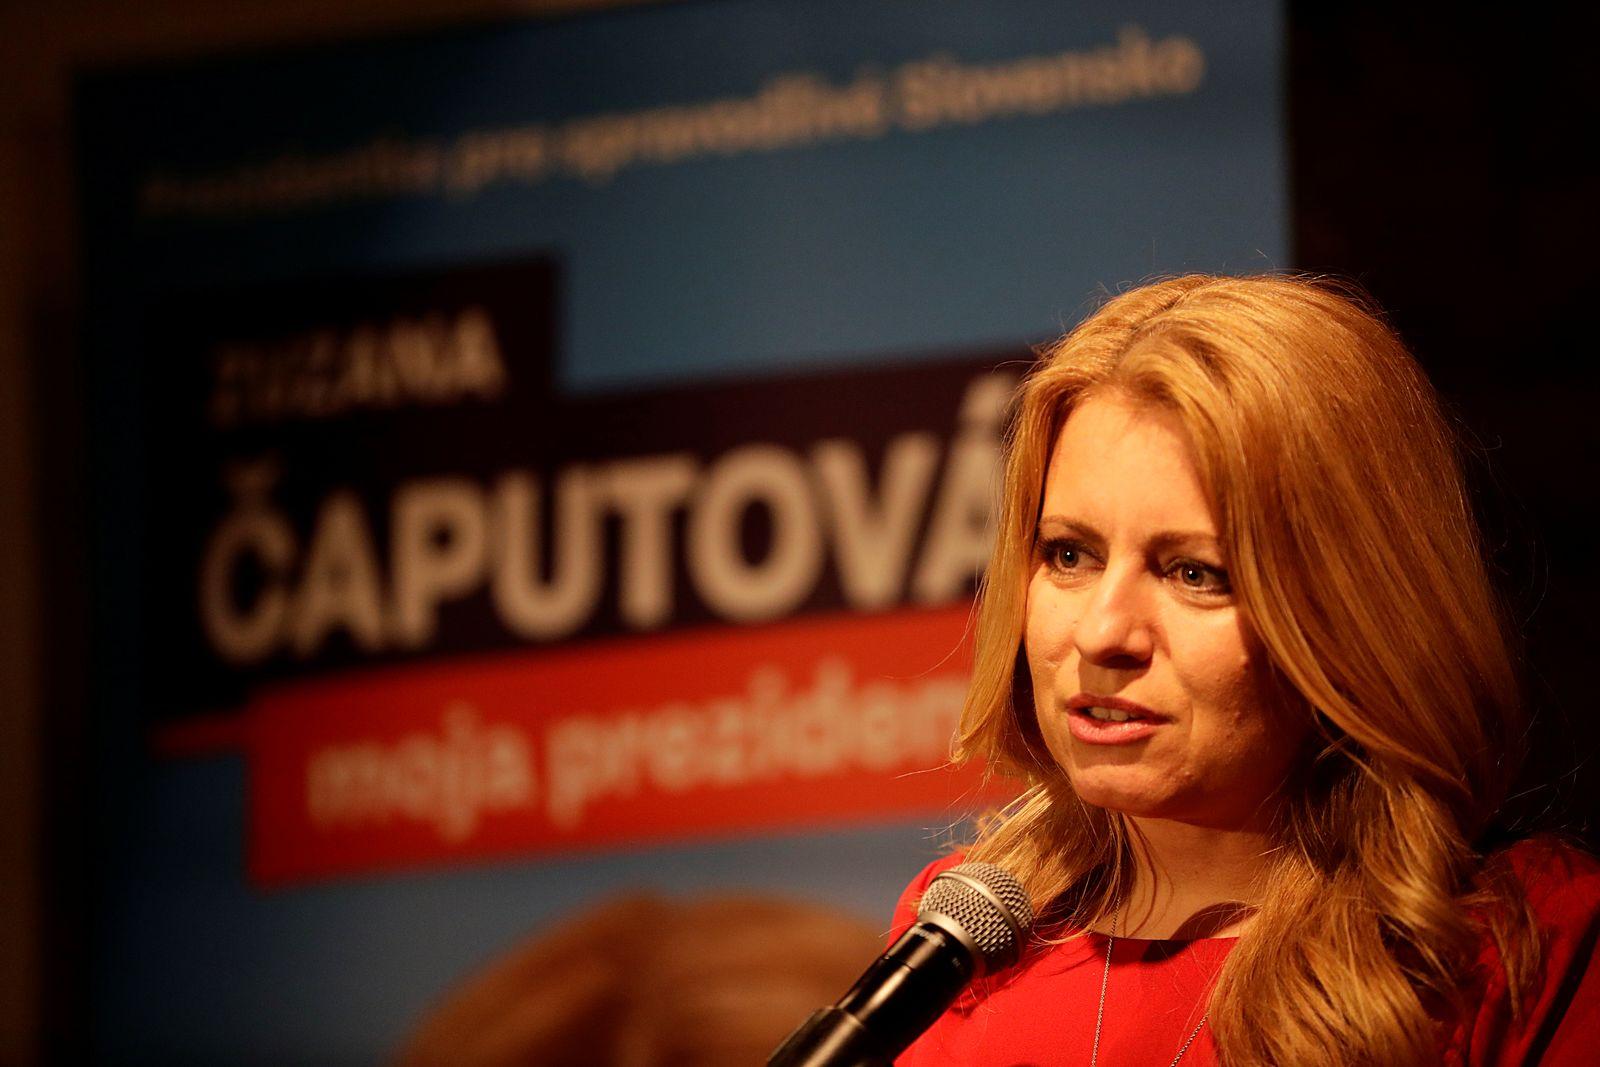 SLOVAKIA-ELECTION/PRESIDENT